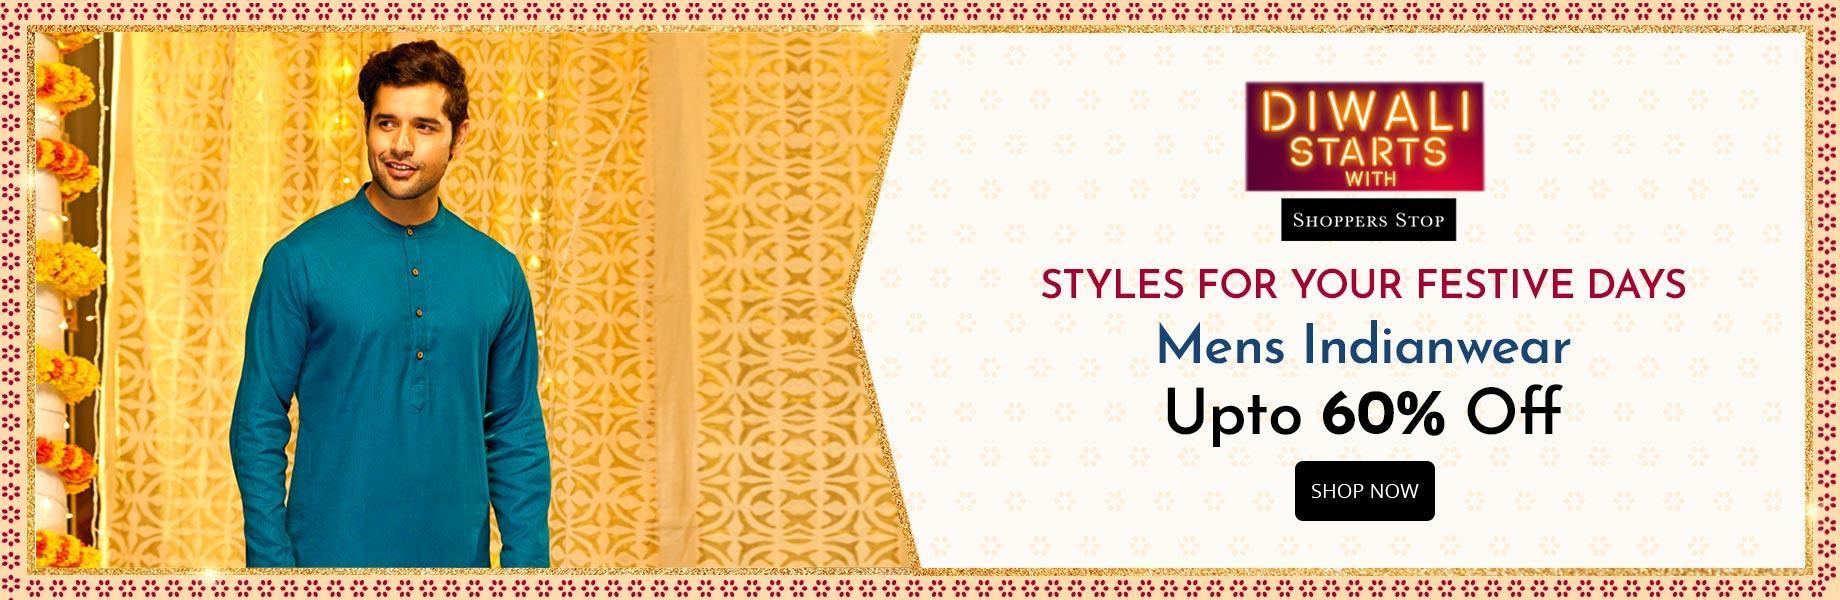 Homepage-Carousals-Mens-Indian-wear-Web.jpg